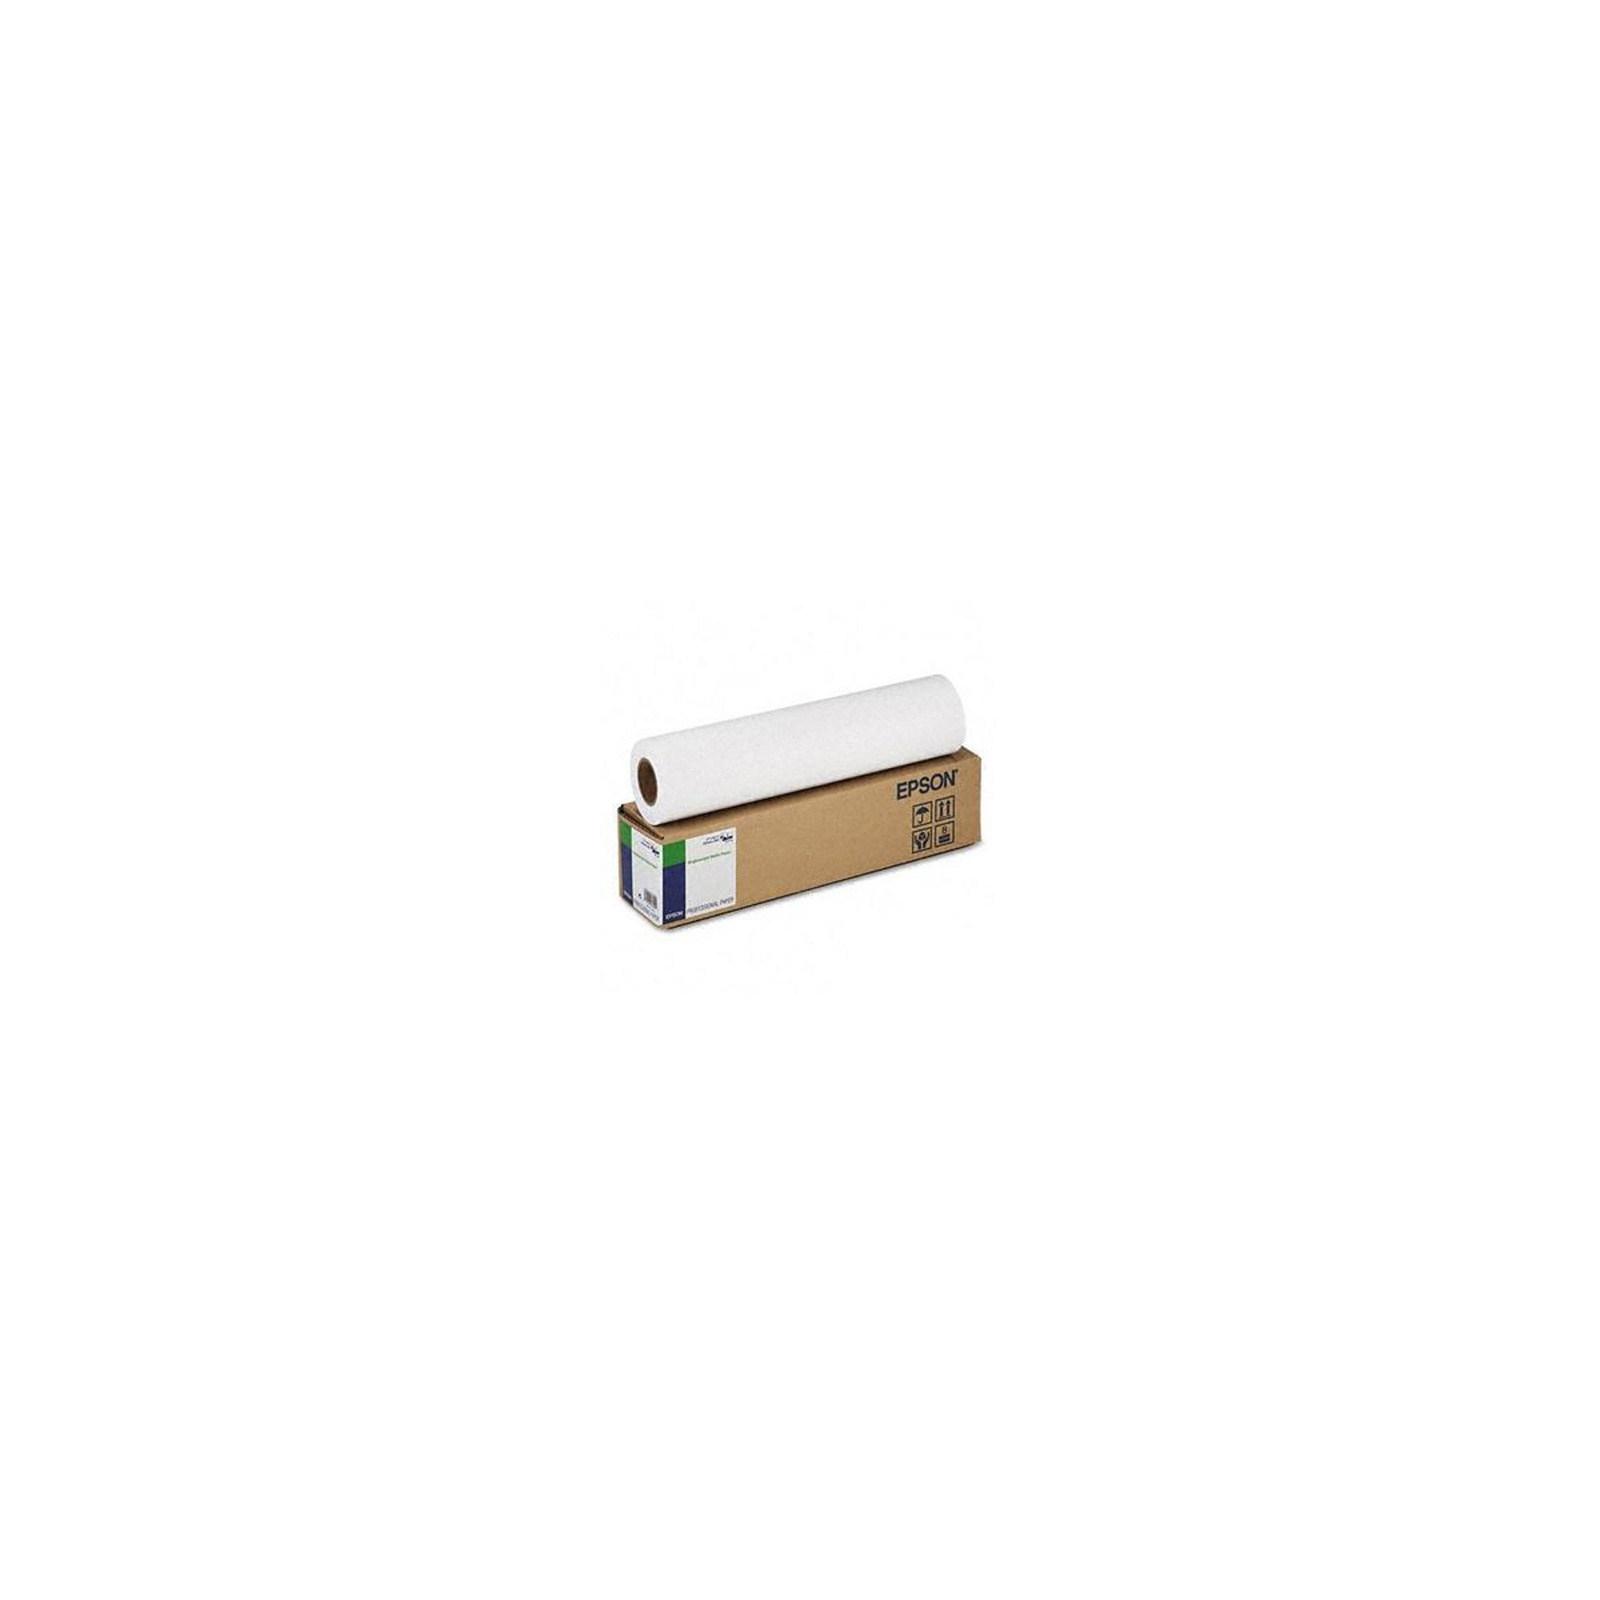 "Бумага EPSON 17"" Standard Proofing Paper (C13S045007)"